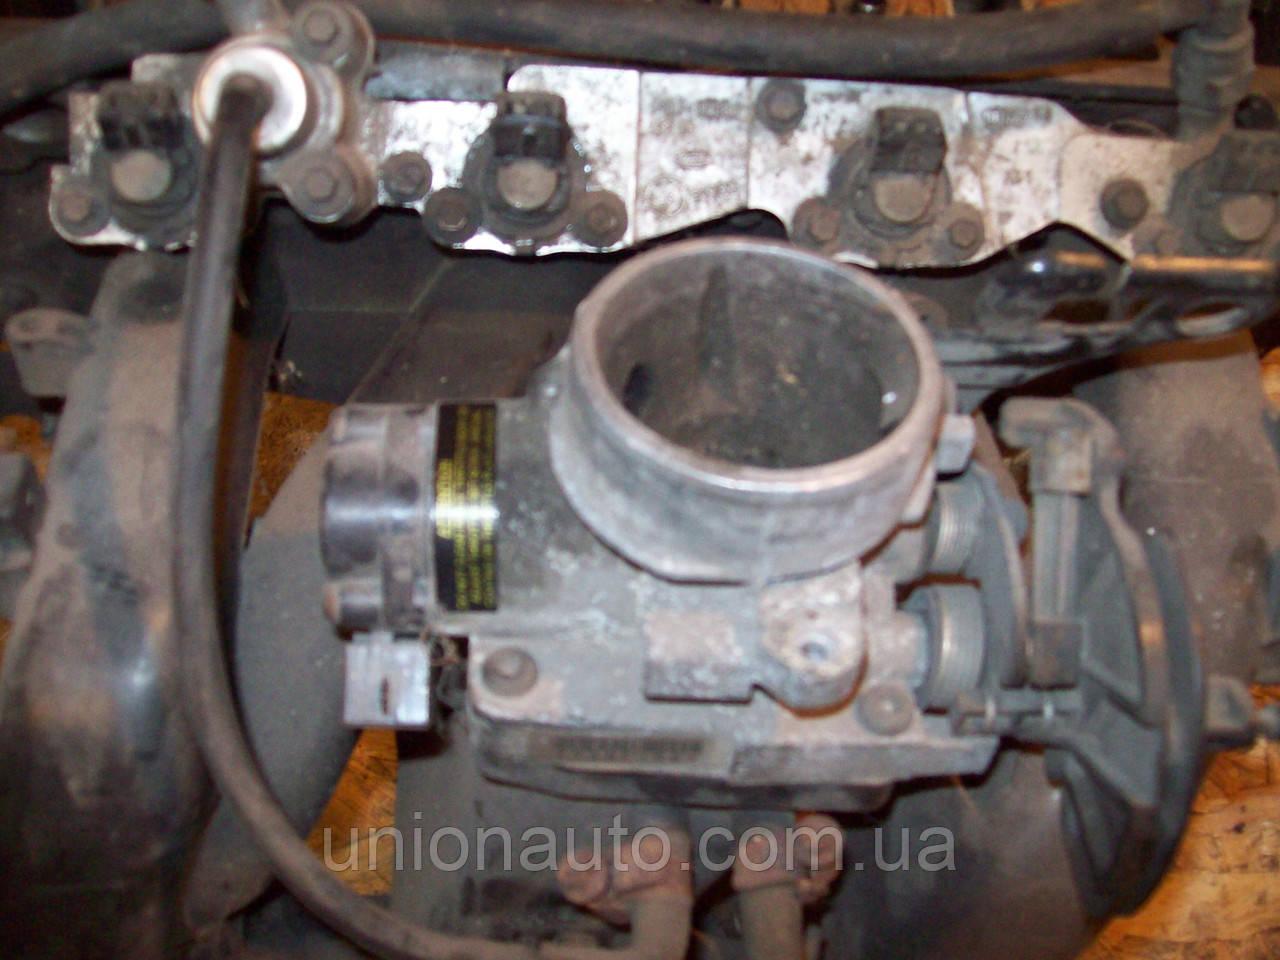 FORD MONDEO MK 1 1.6 16V Дроссельная заслонка 938F-RB